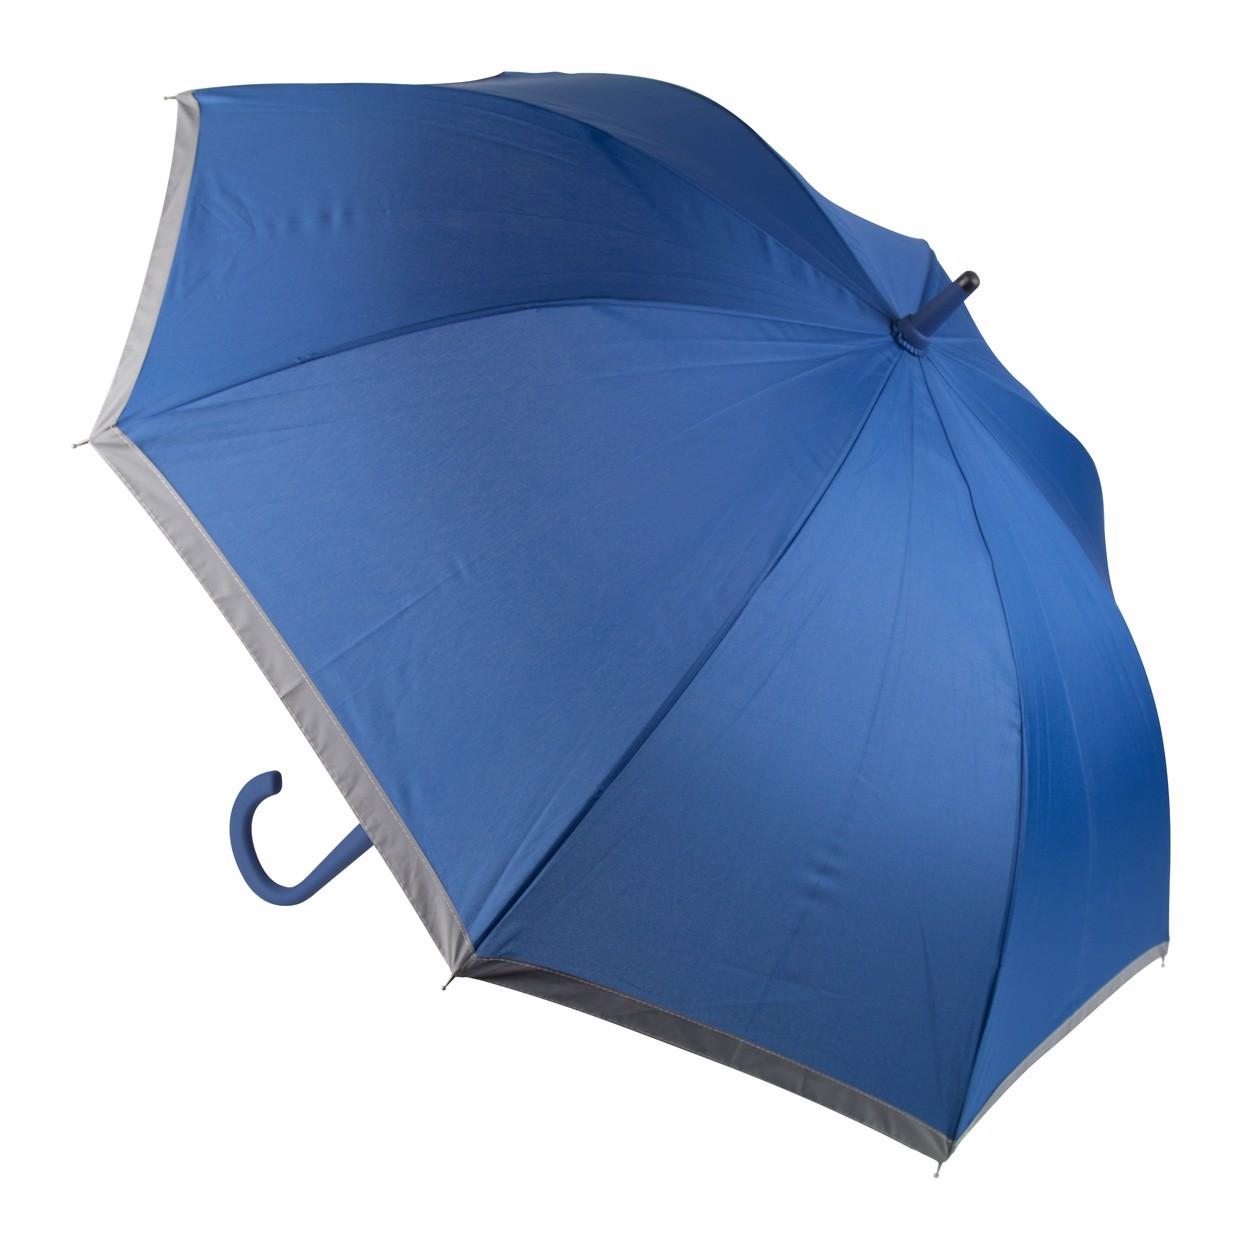 Deštník Nimbos - Modrá